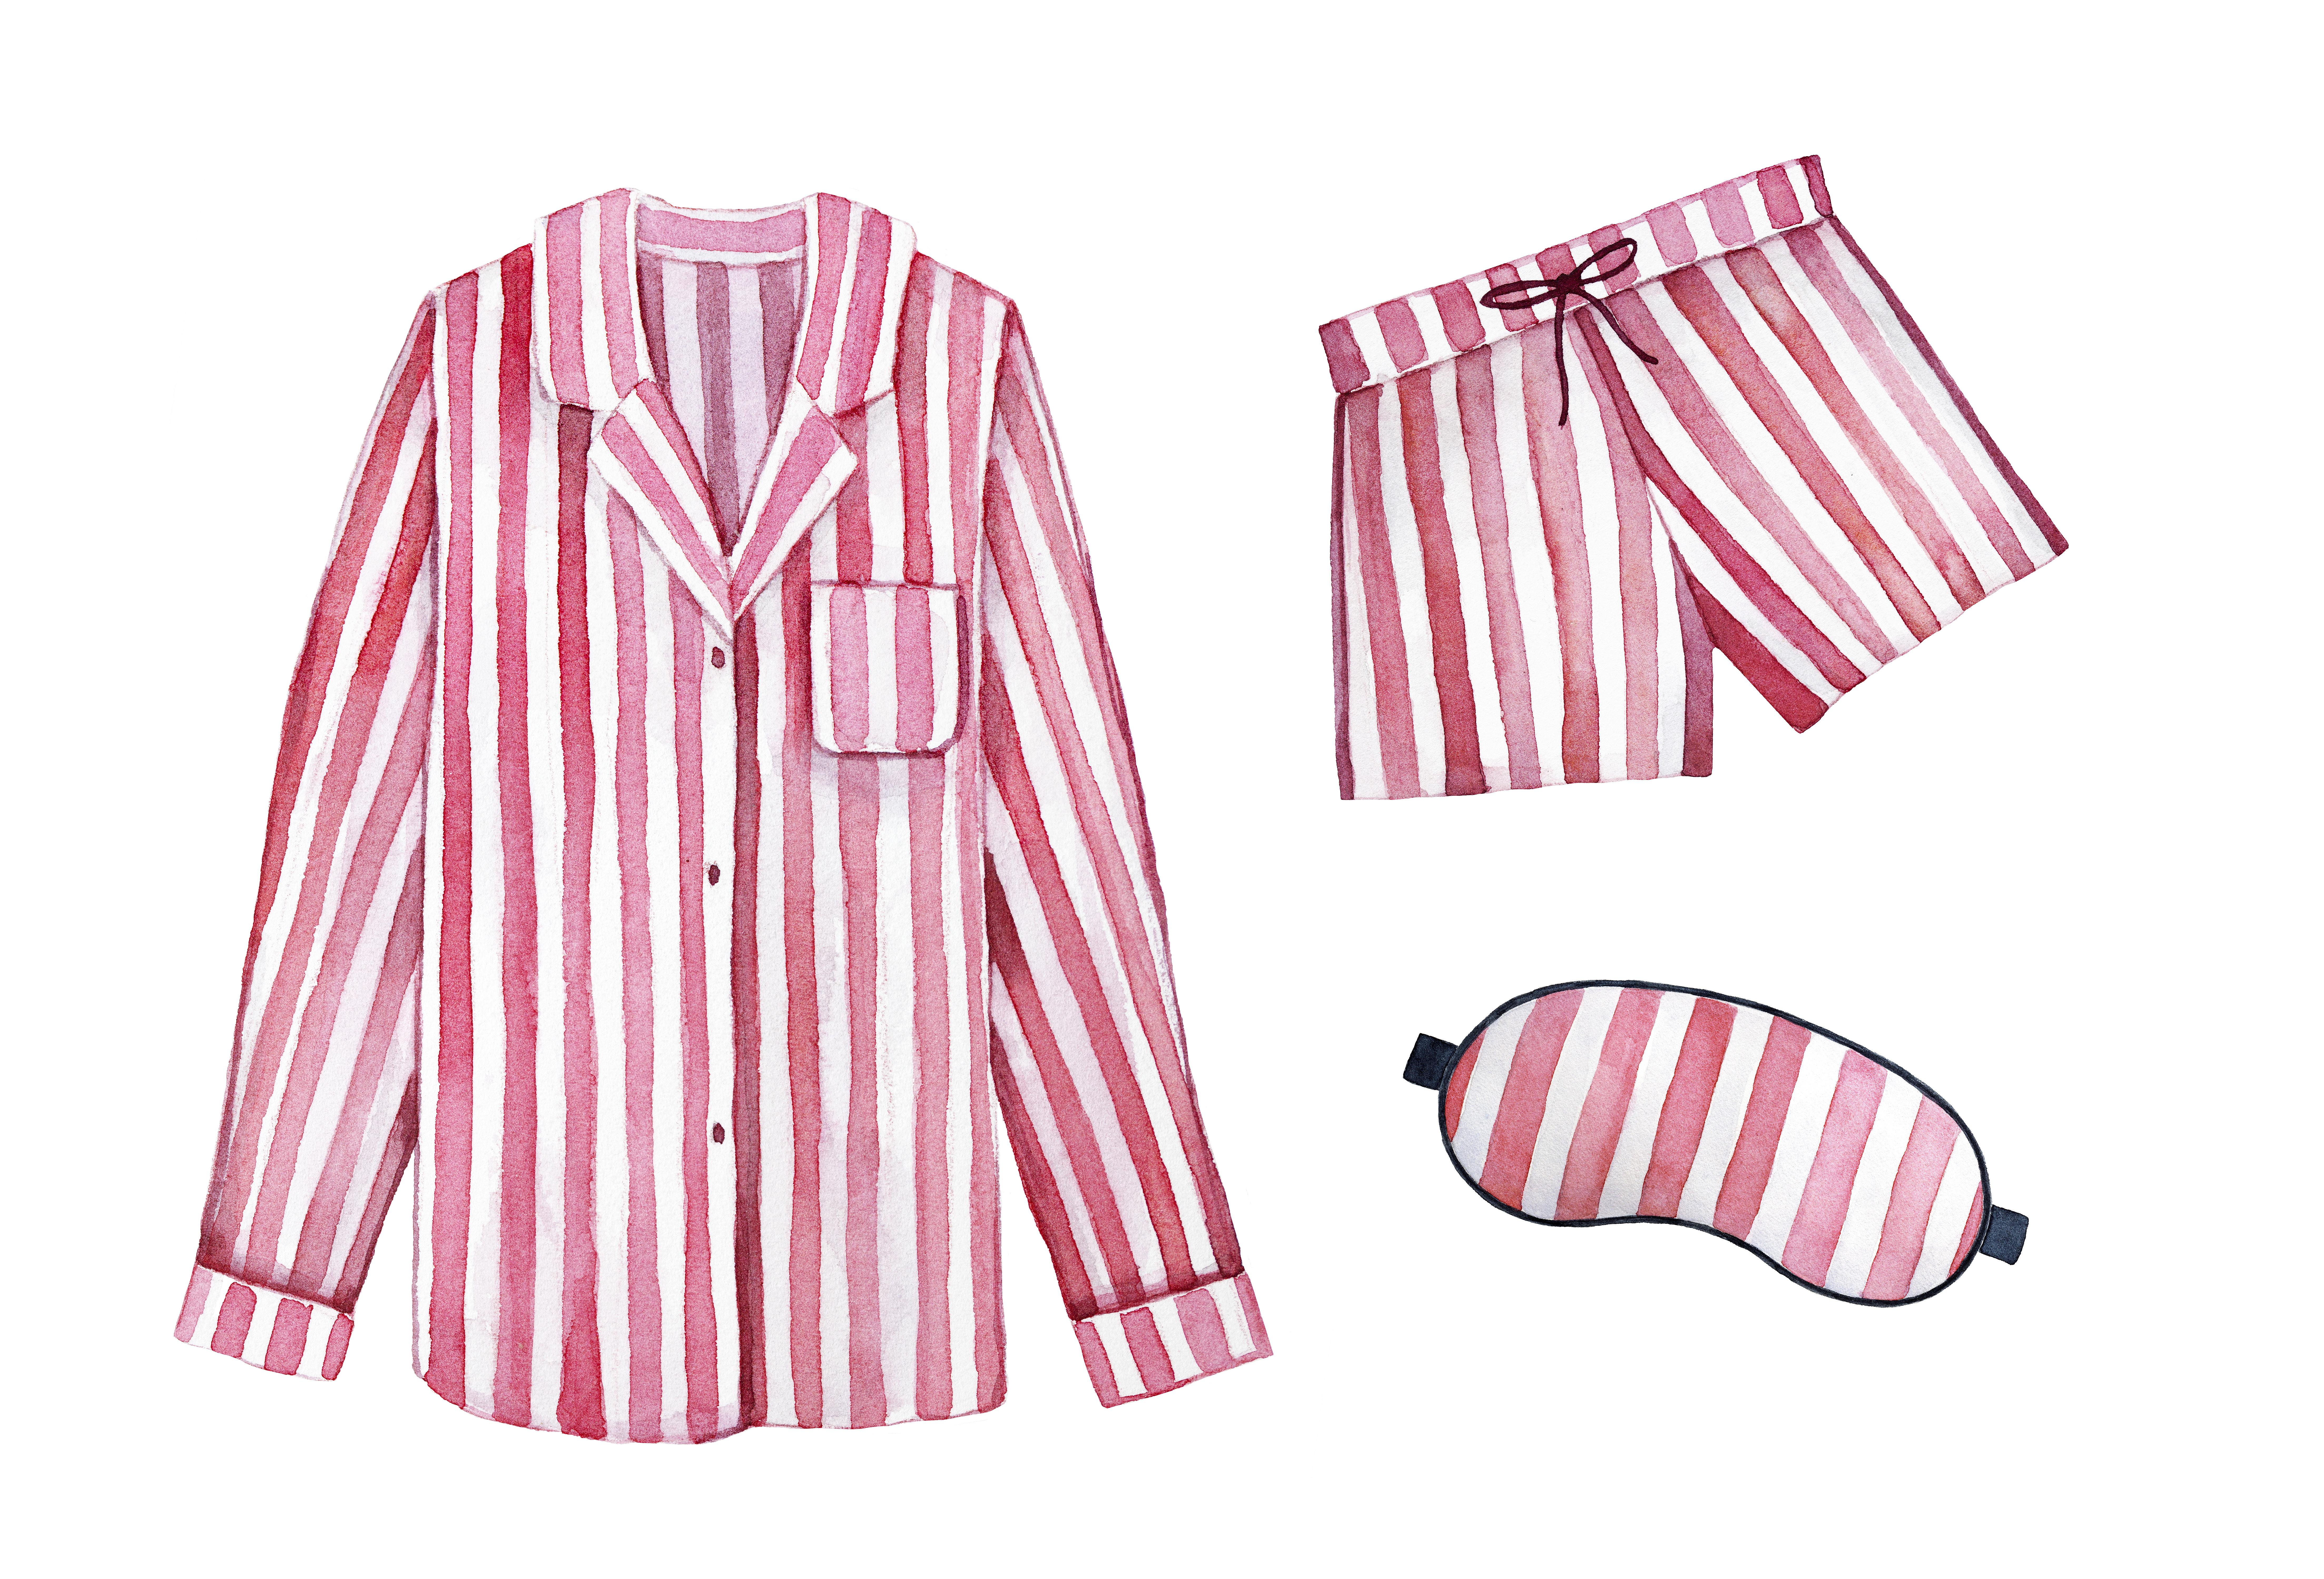 cozy pajama sets